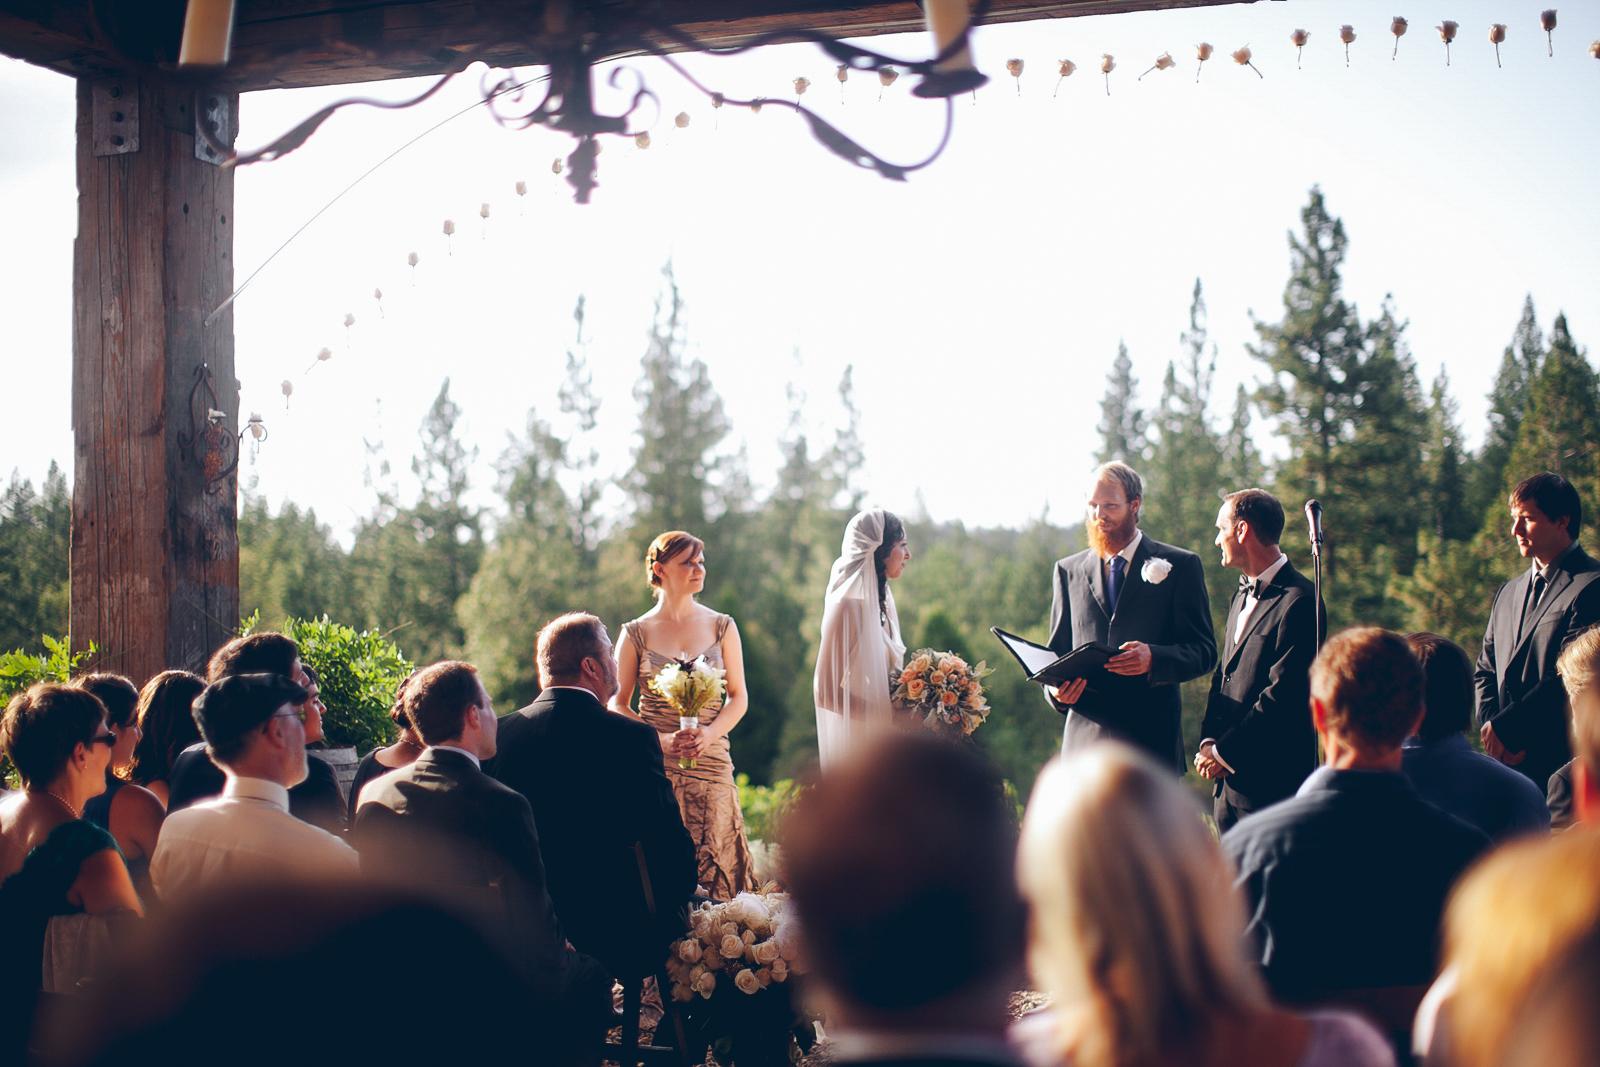 miraflores_winery_wedding_photography_ian_melissa_ebony_siovhan_bokeh_photography_27.jpg